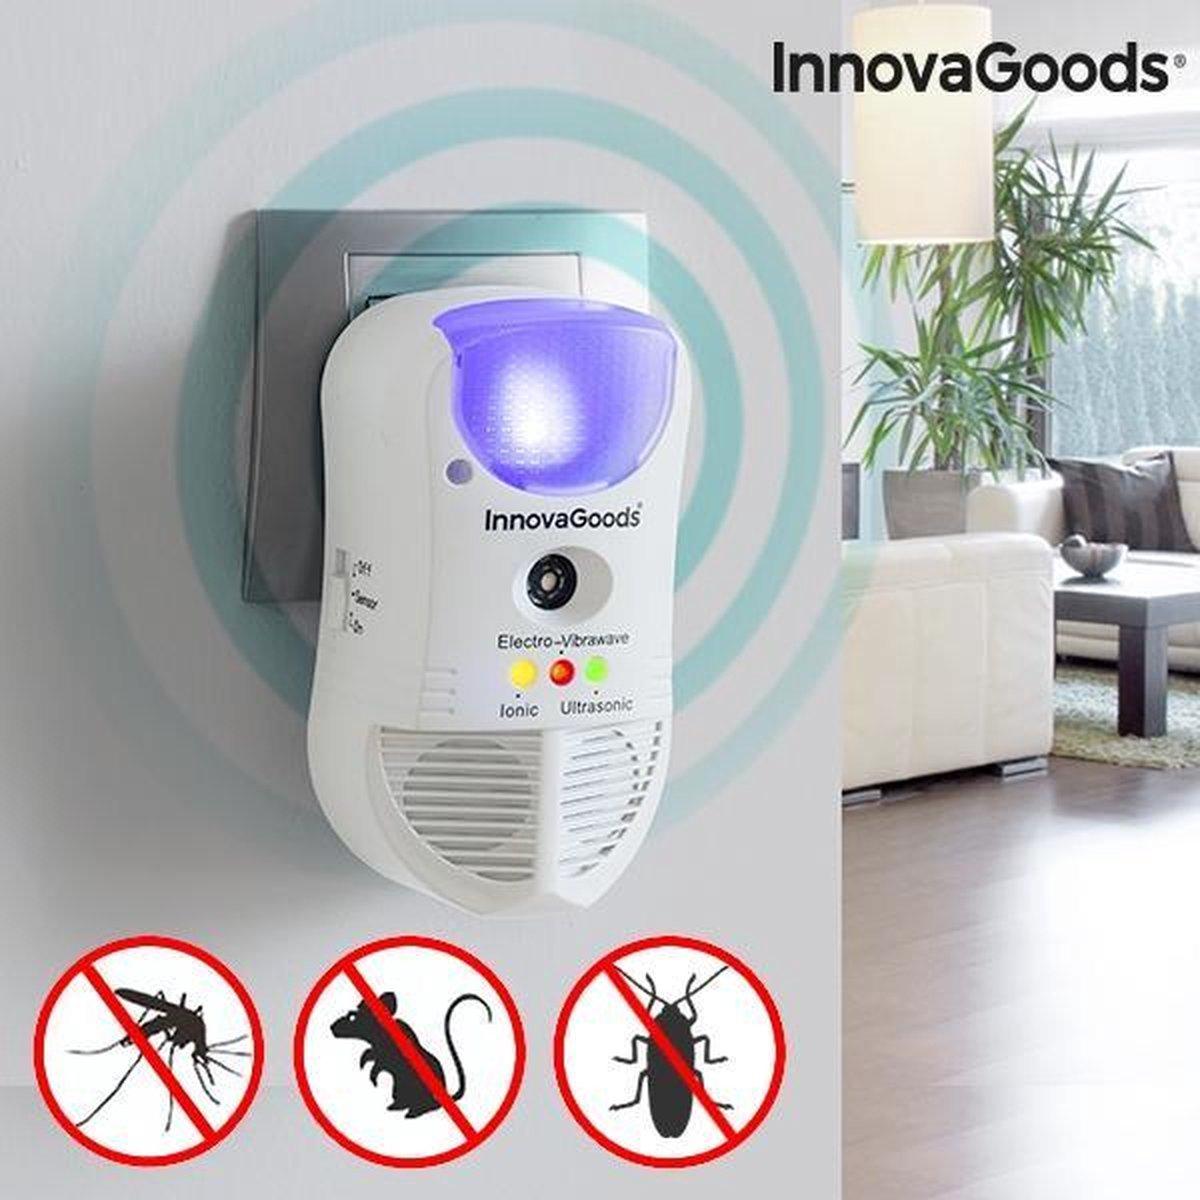 InnovaGoods Home Pest 5-in-1 Ongediertebestrijder met Ledlicht en Sensor